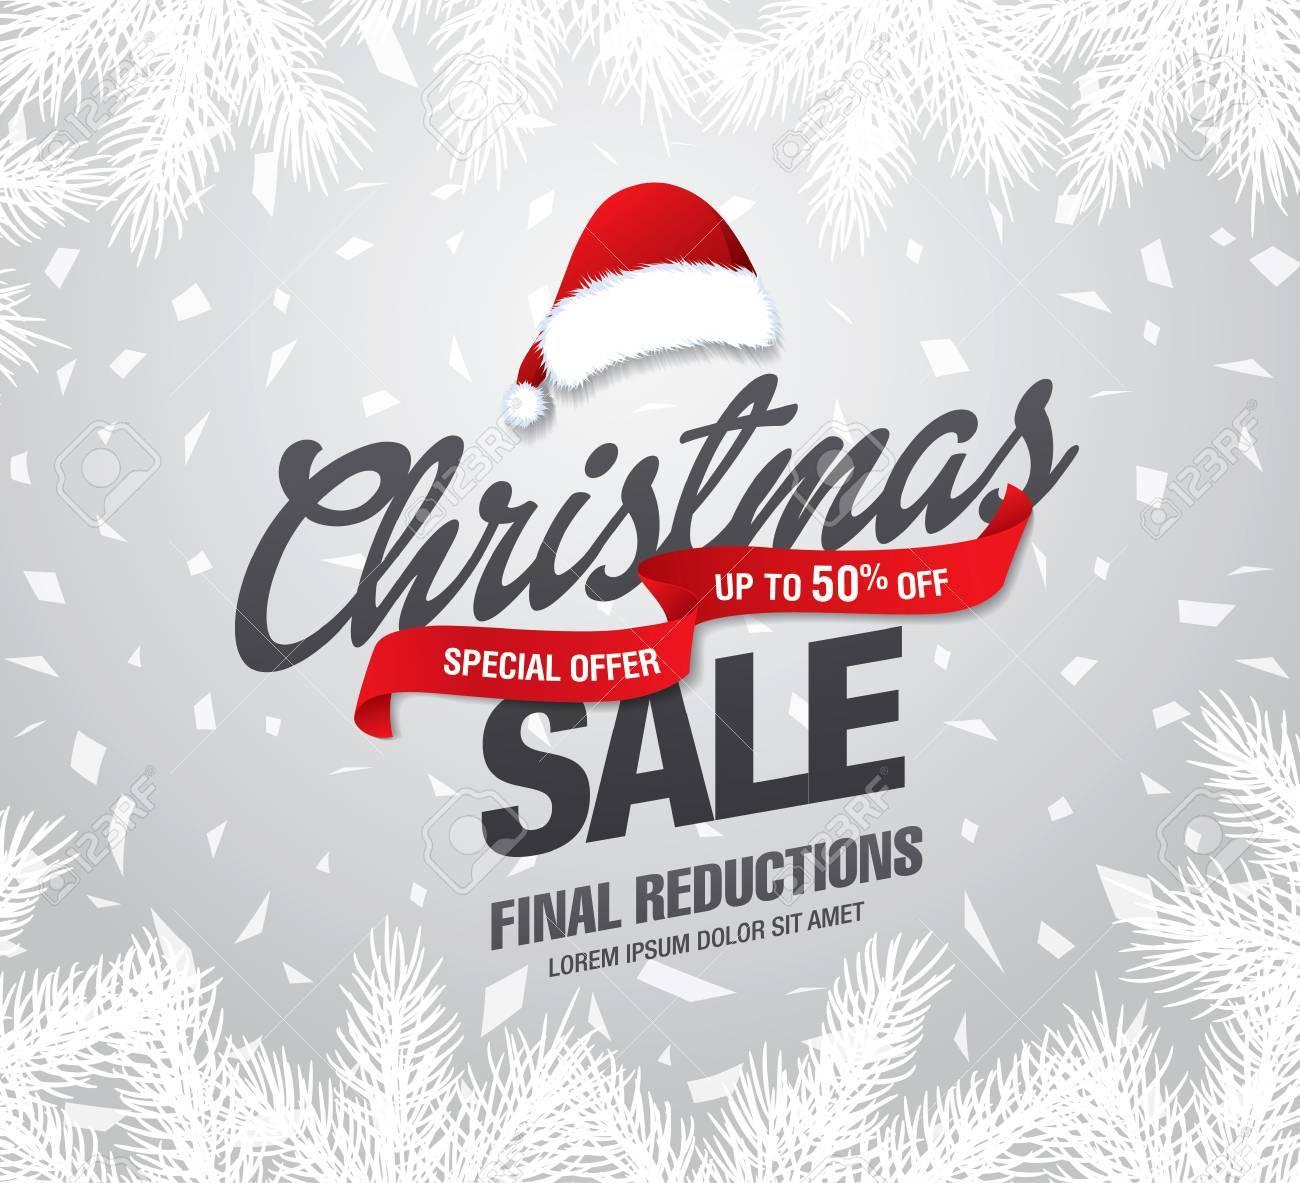 Christmas sale banner, vector illustration - 67788315